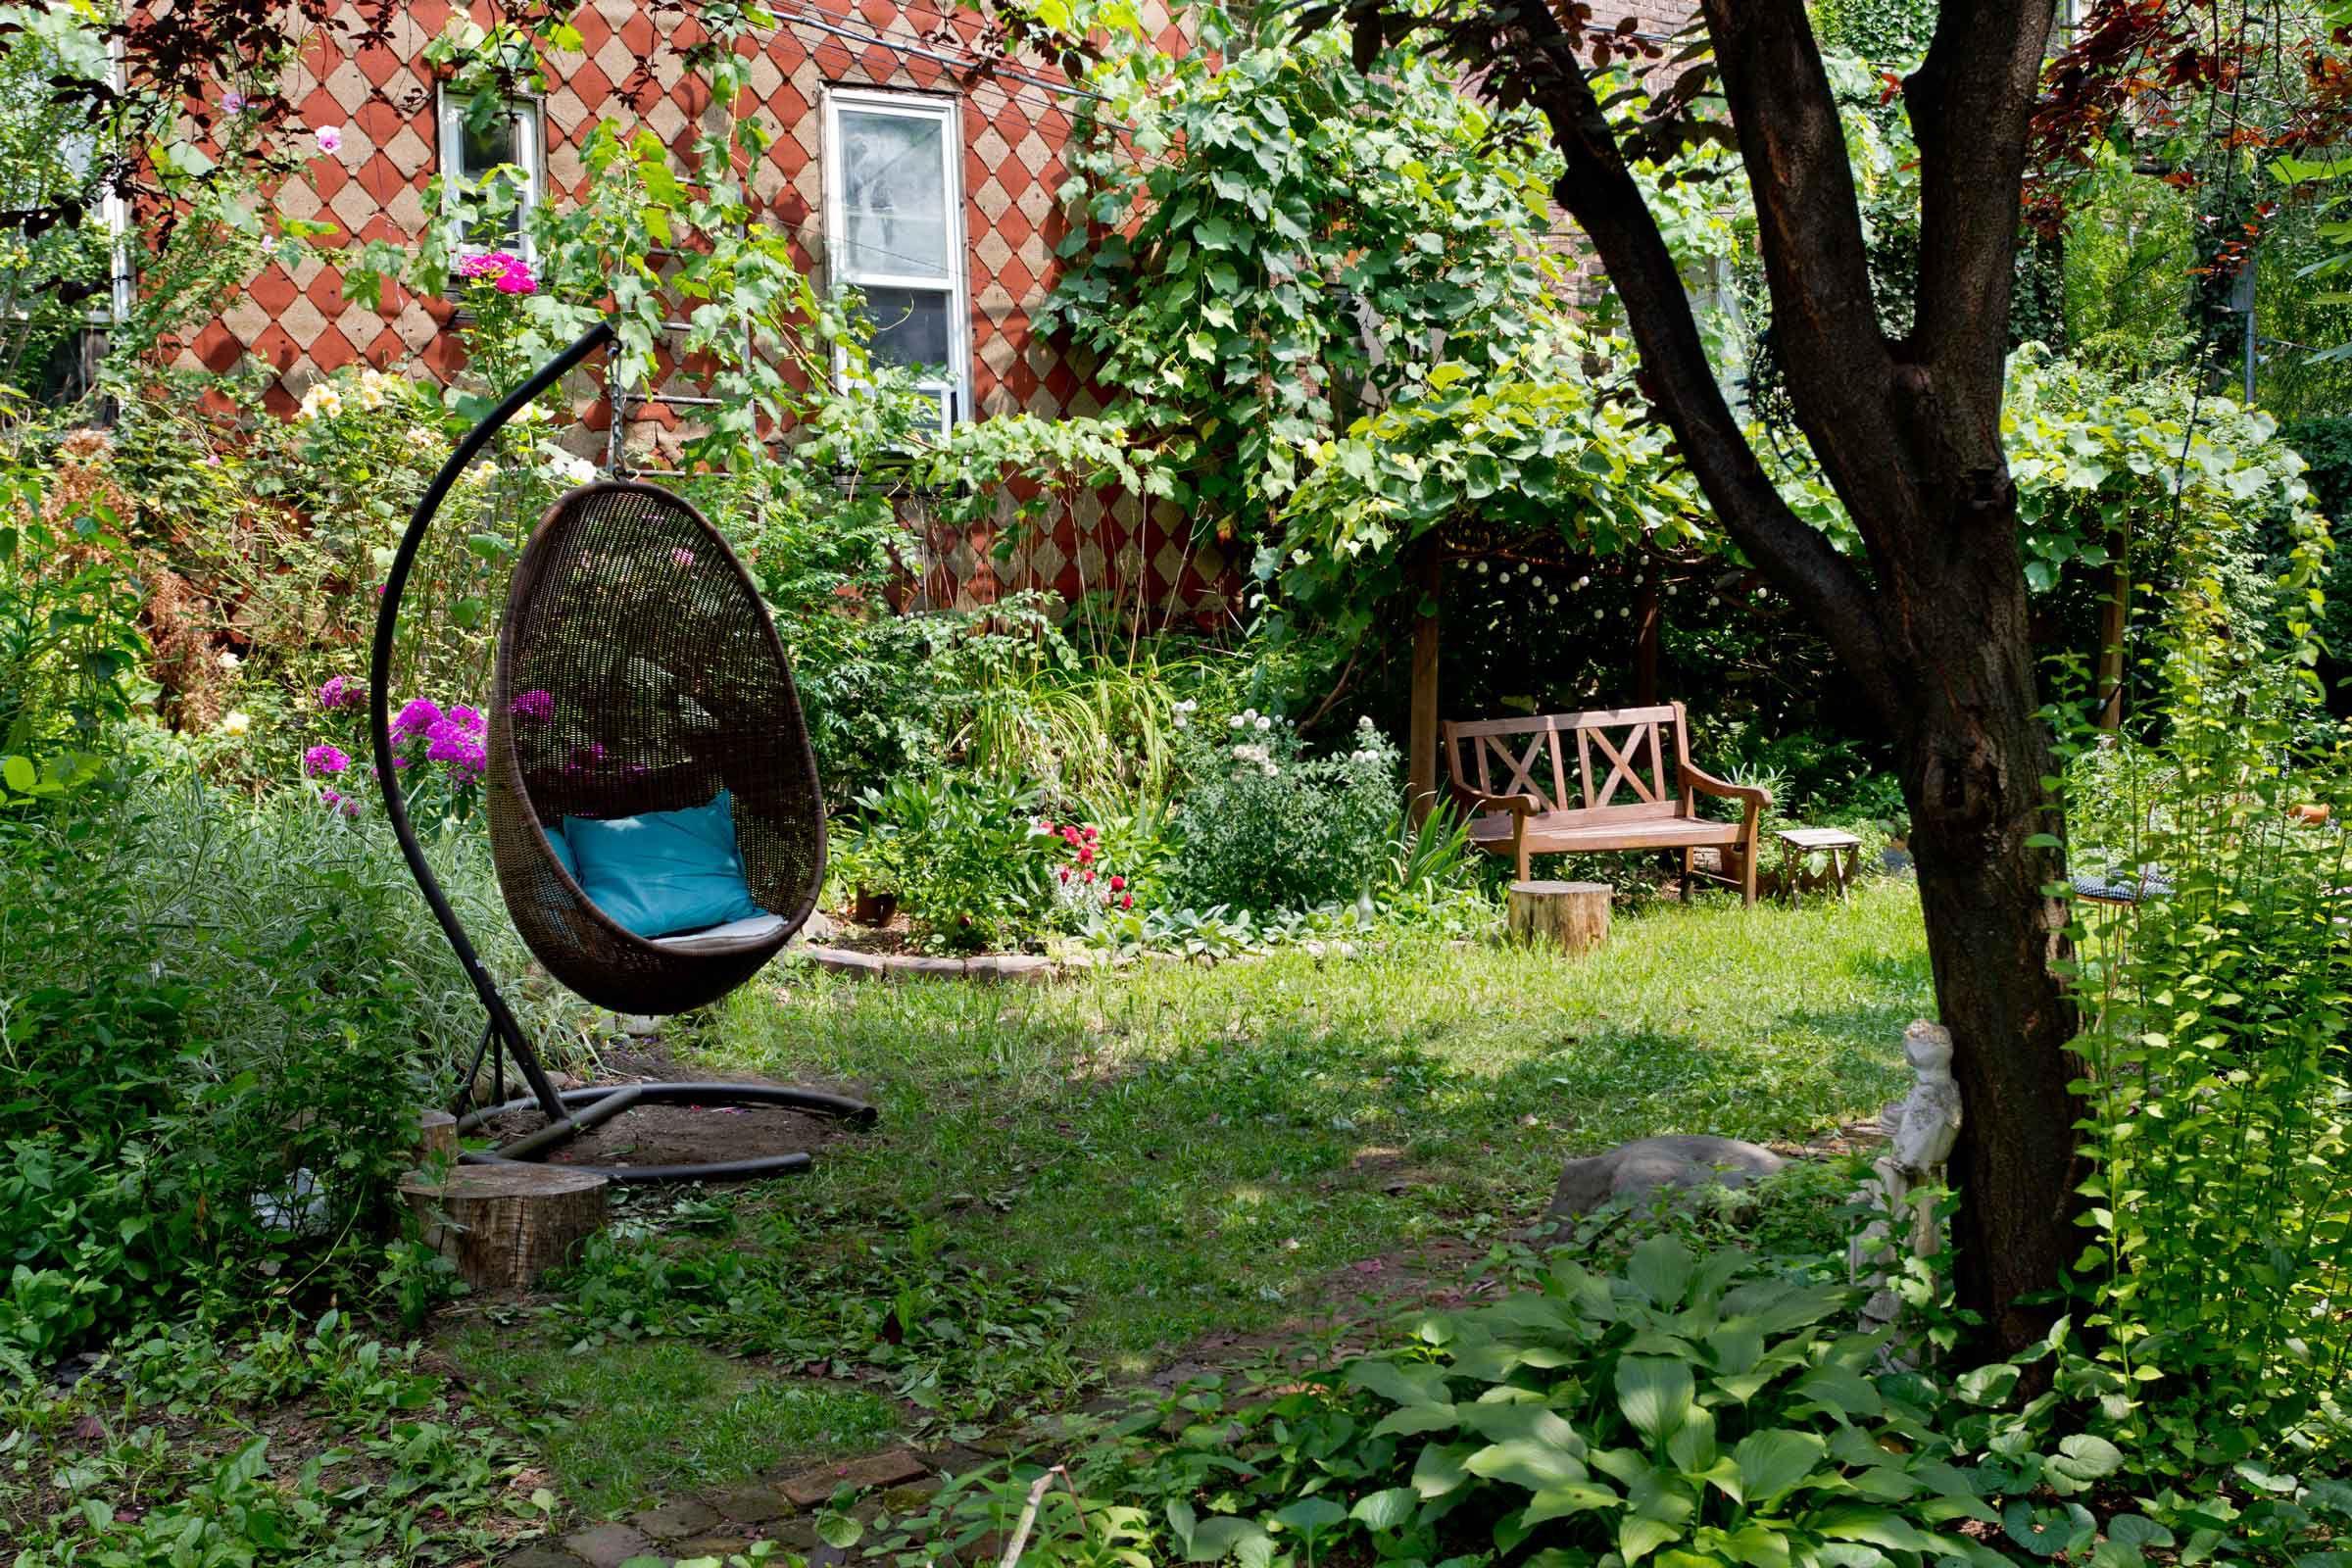 backyard-swing-greenery-nyc